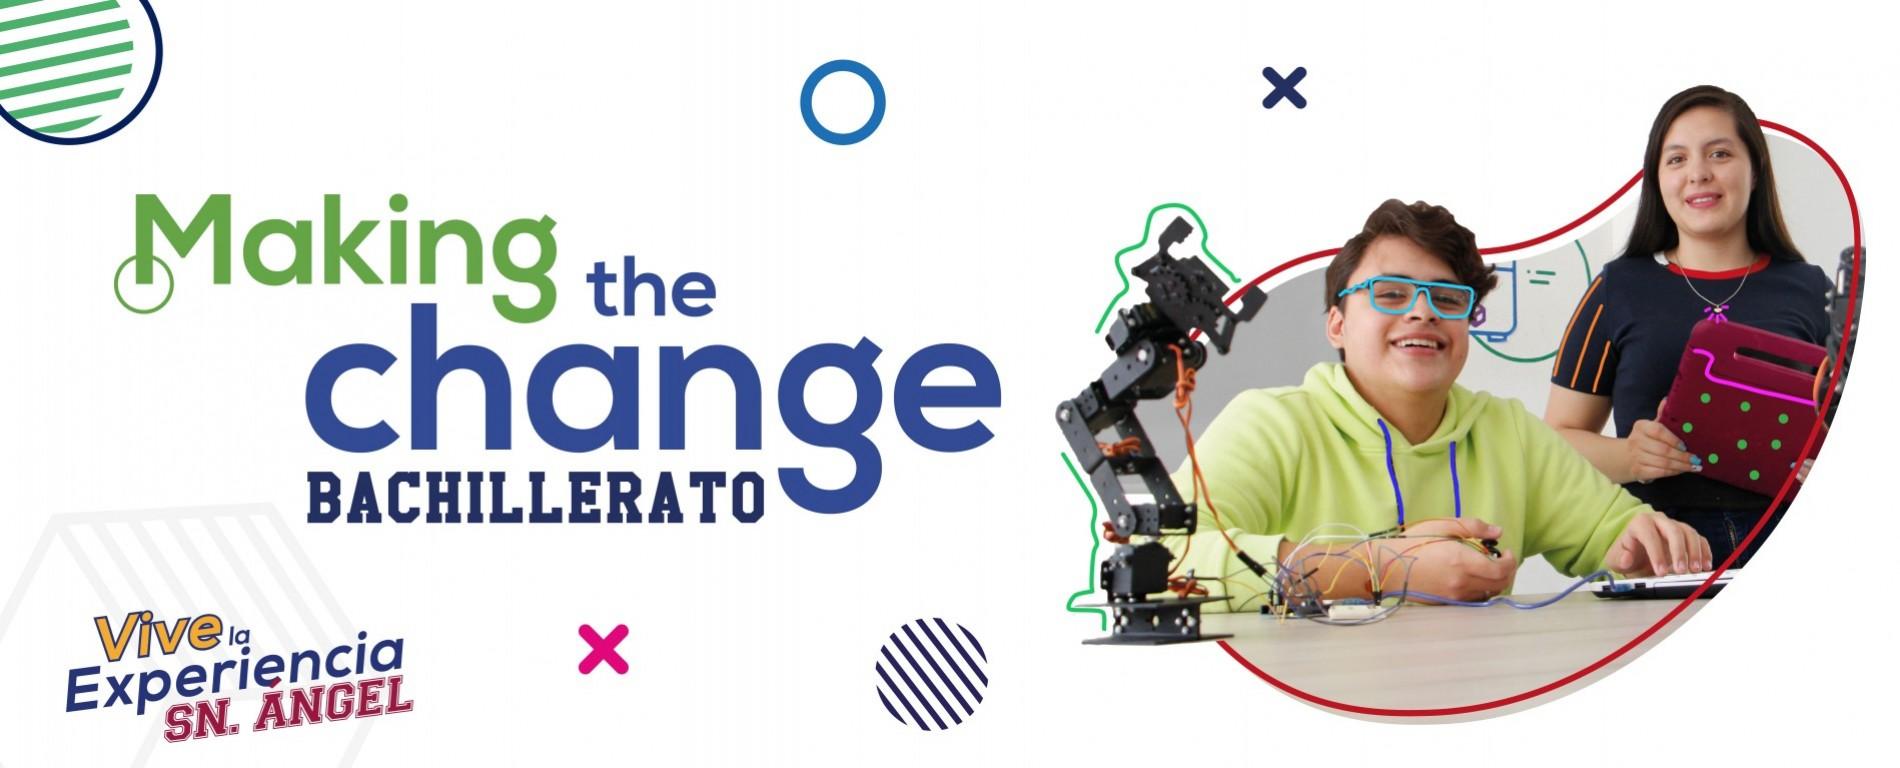 Making the change - Bachillerato